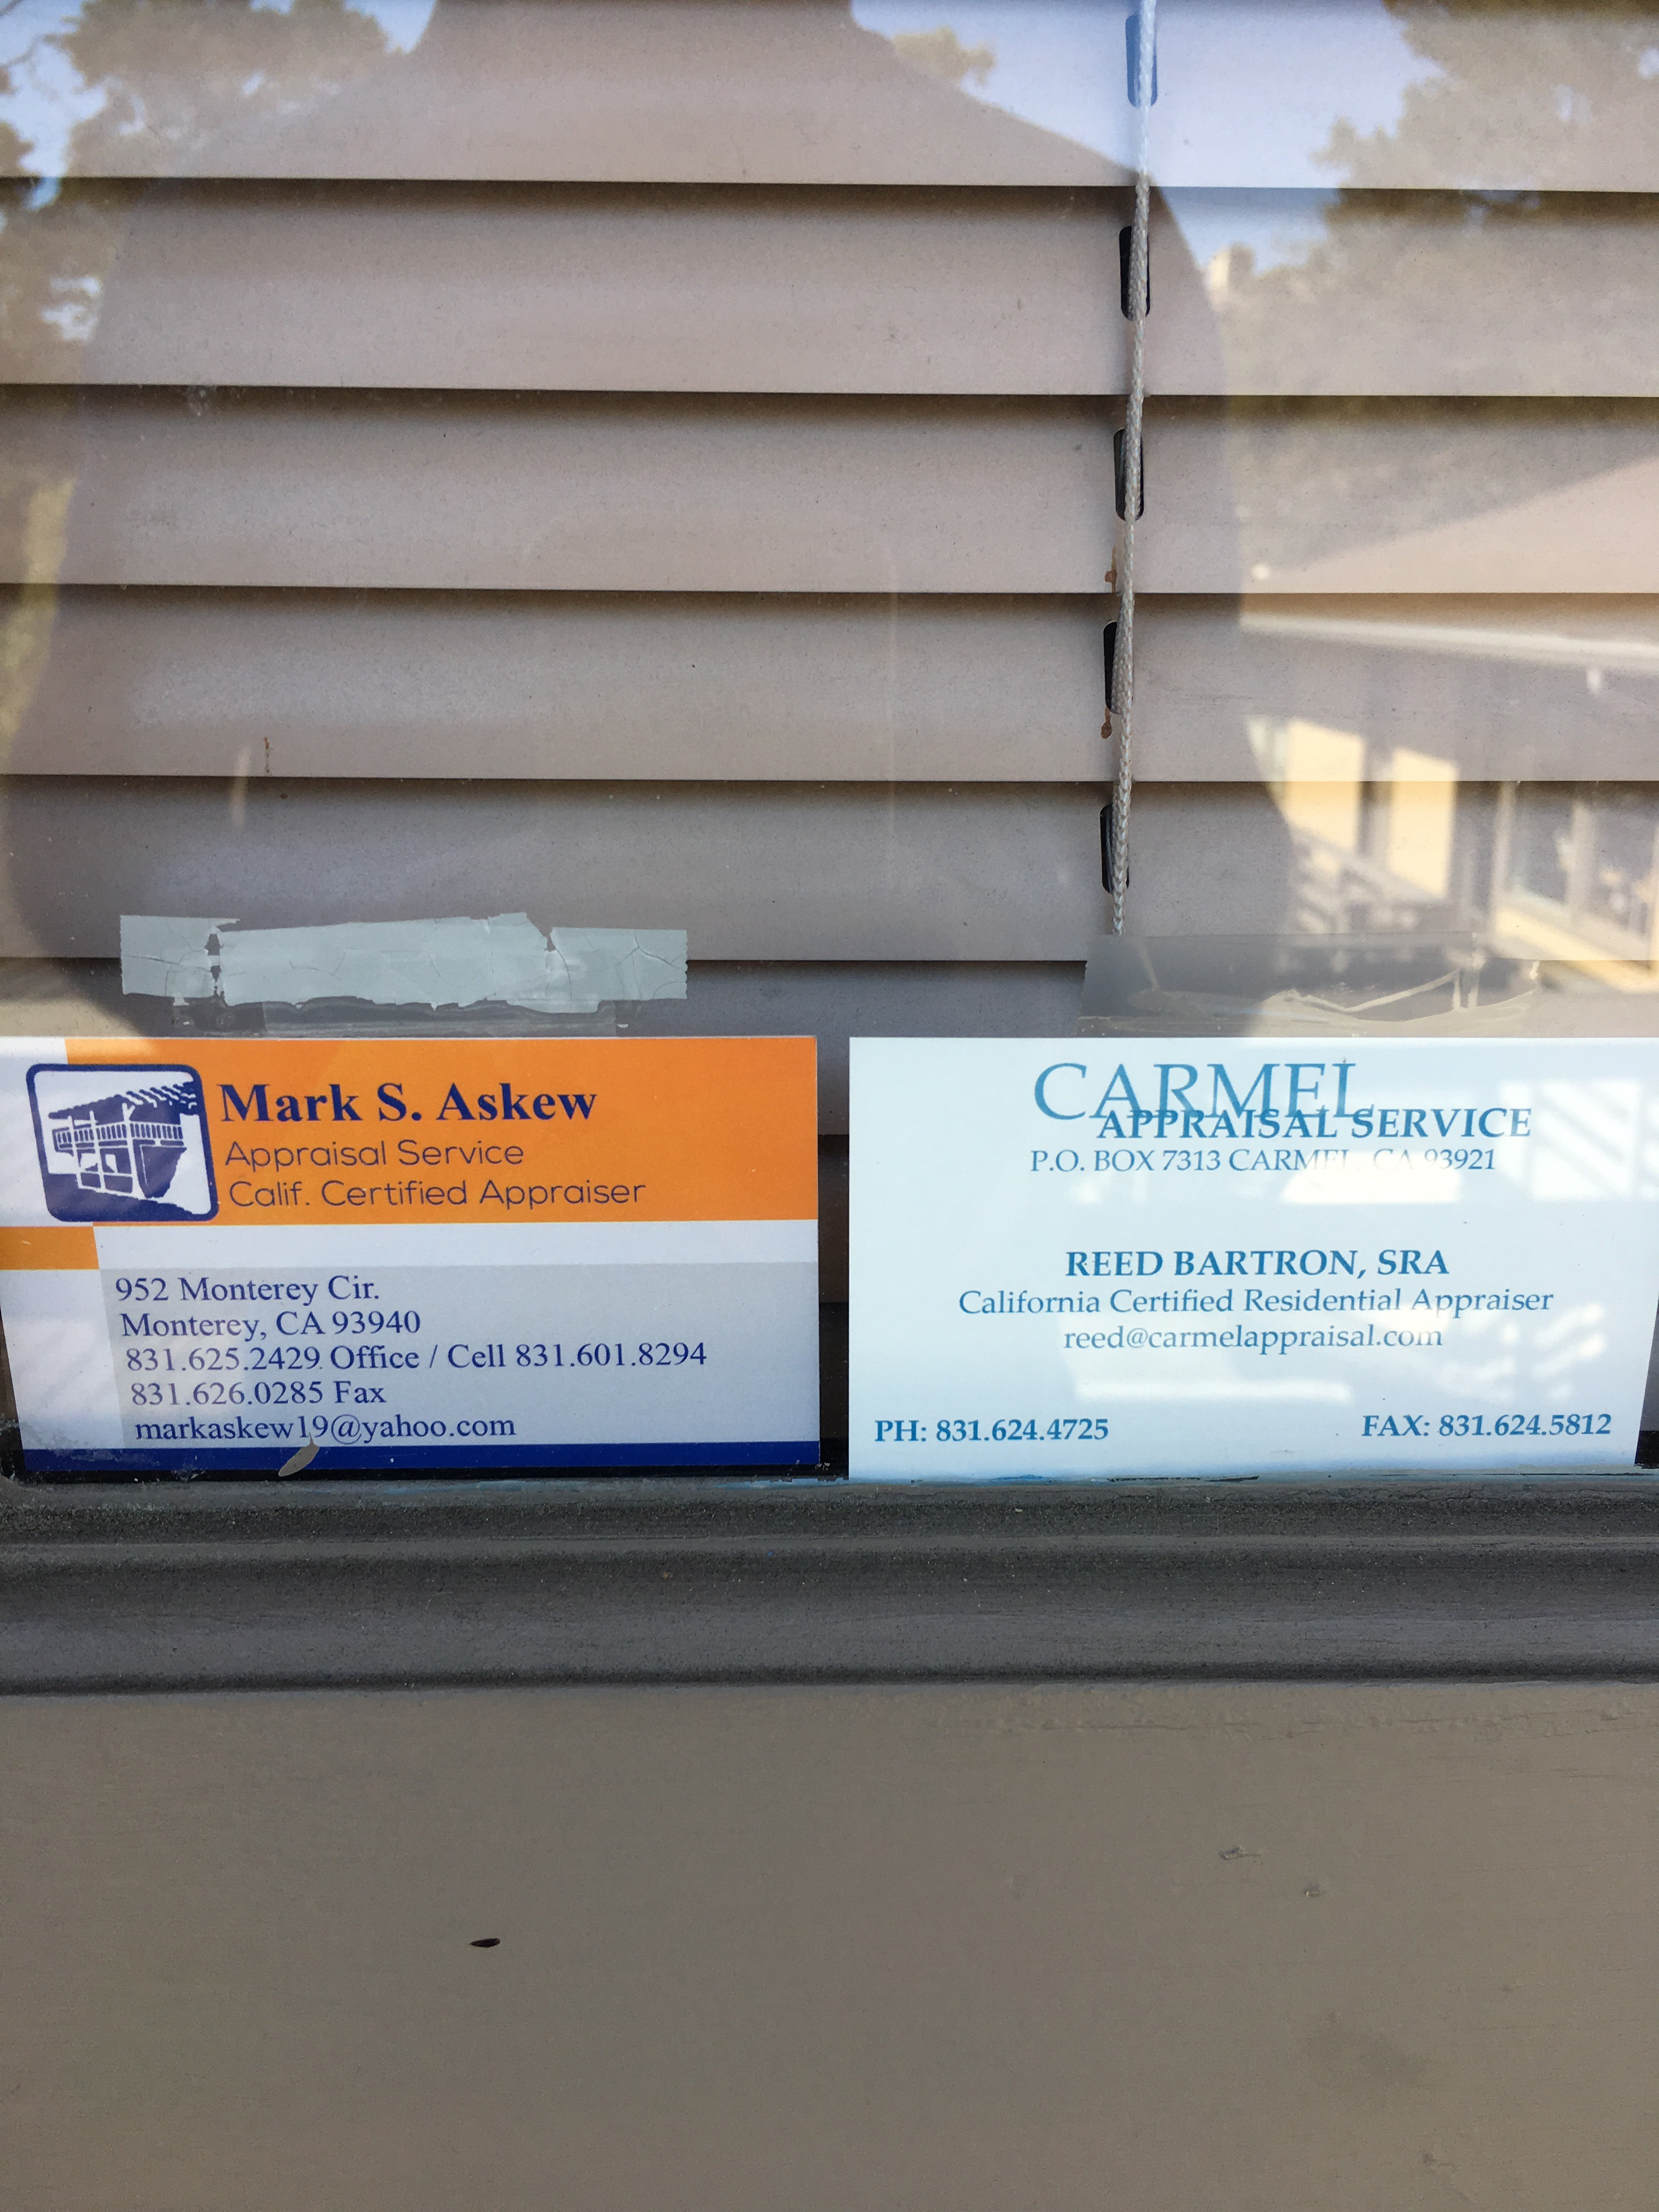 Carmel Appraisal Service